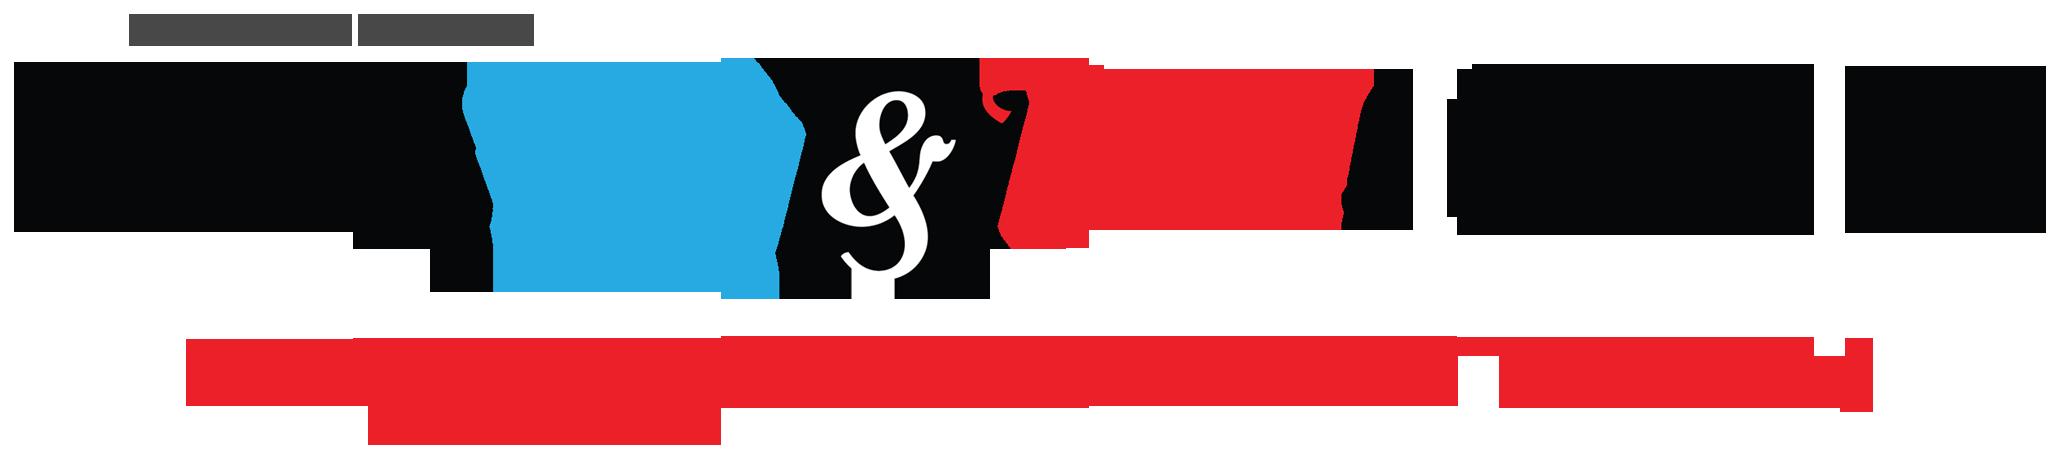 Big Bold Bad Store